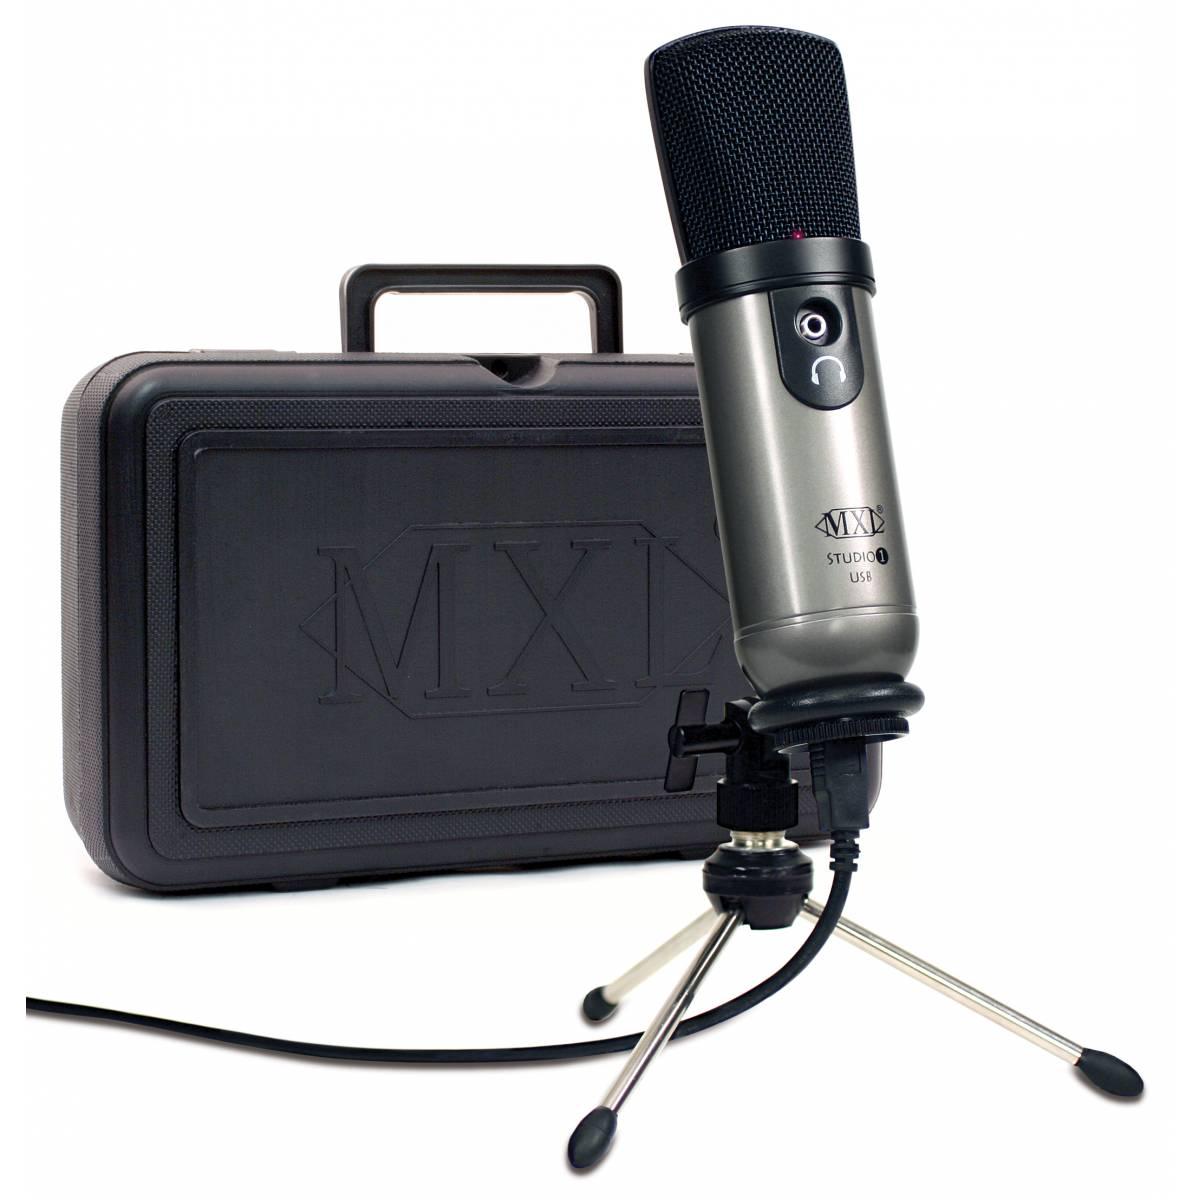 mxl studio 1 pro usb microphone usb microphones from inta audio uk. Black Bedroom Furniture Sets. Home Design Ideas